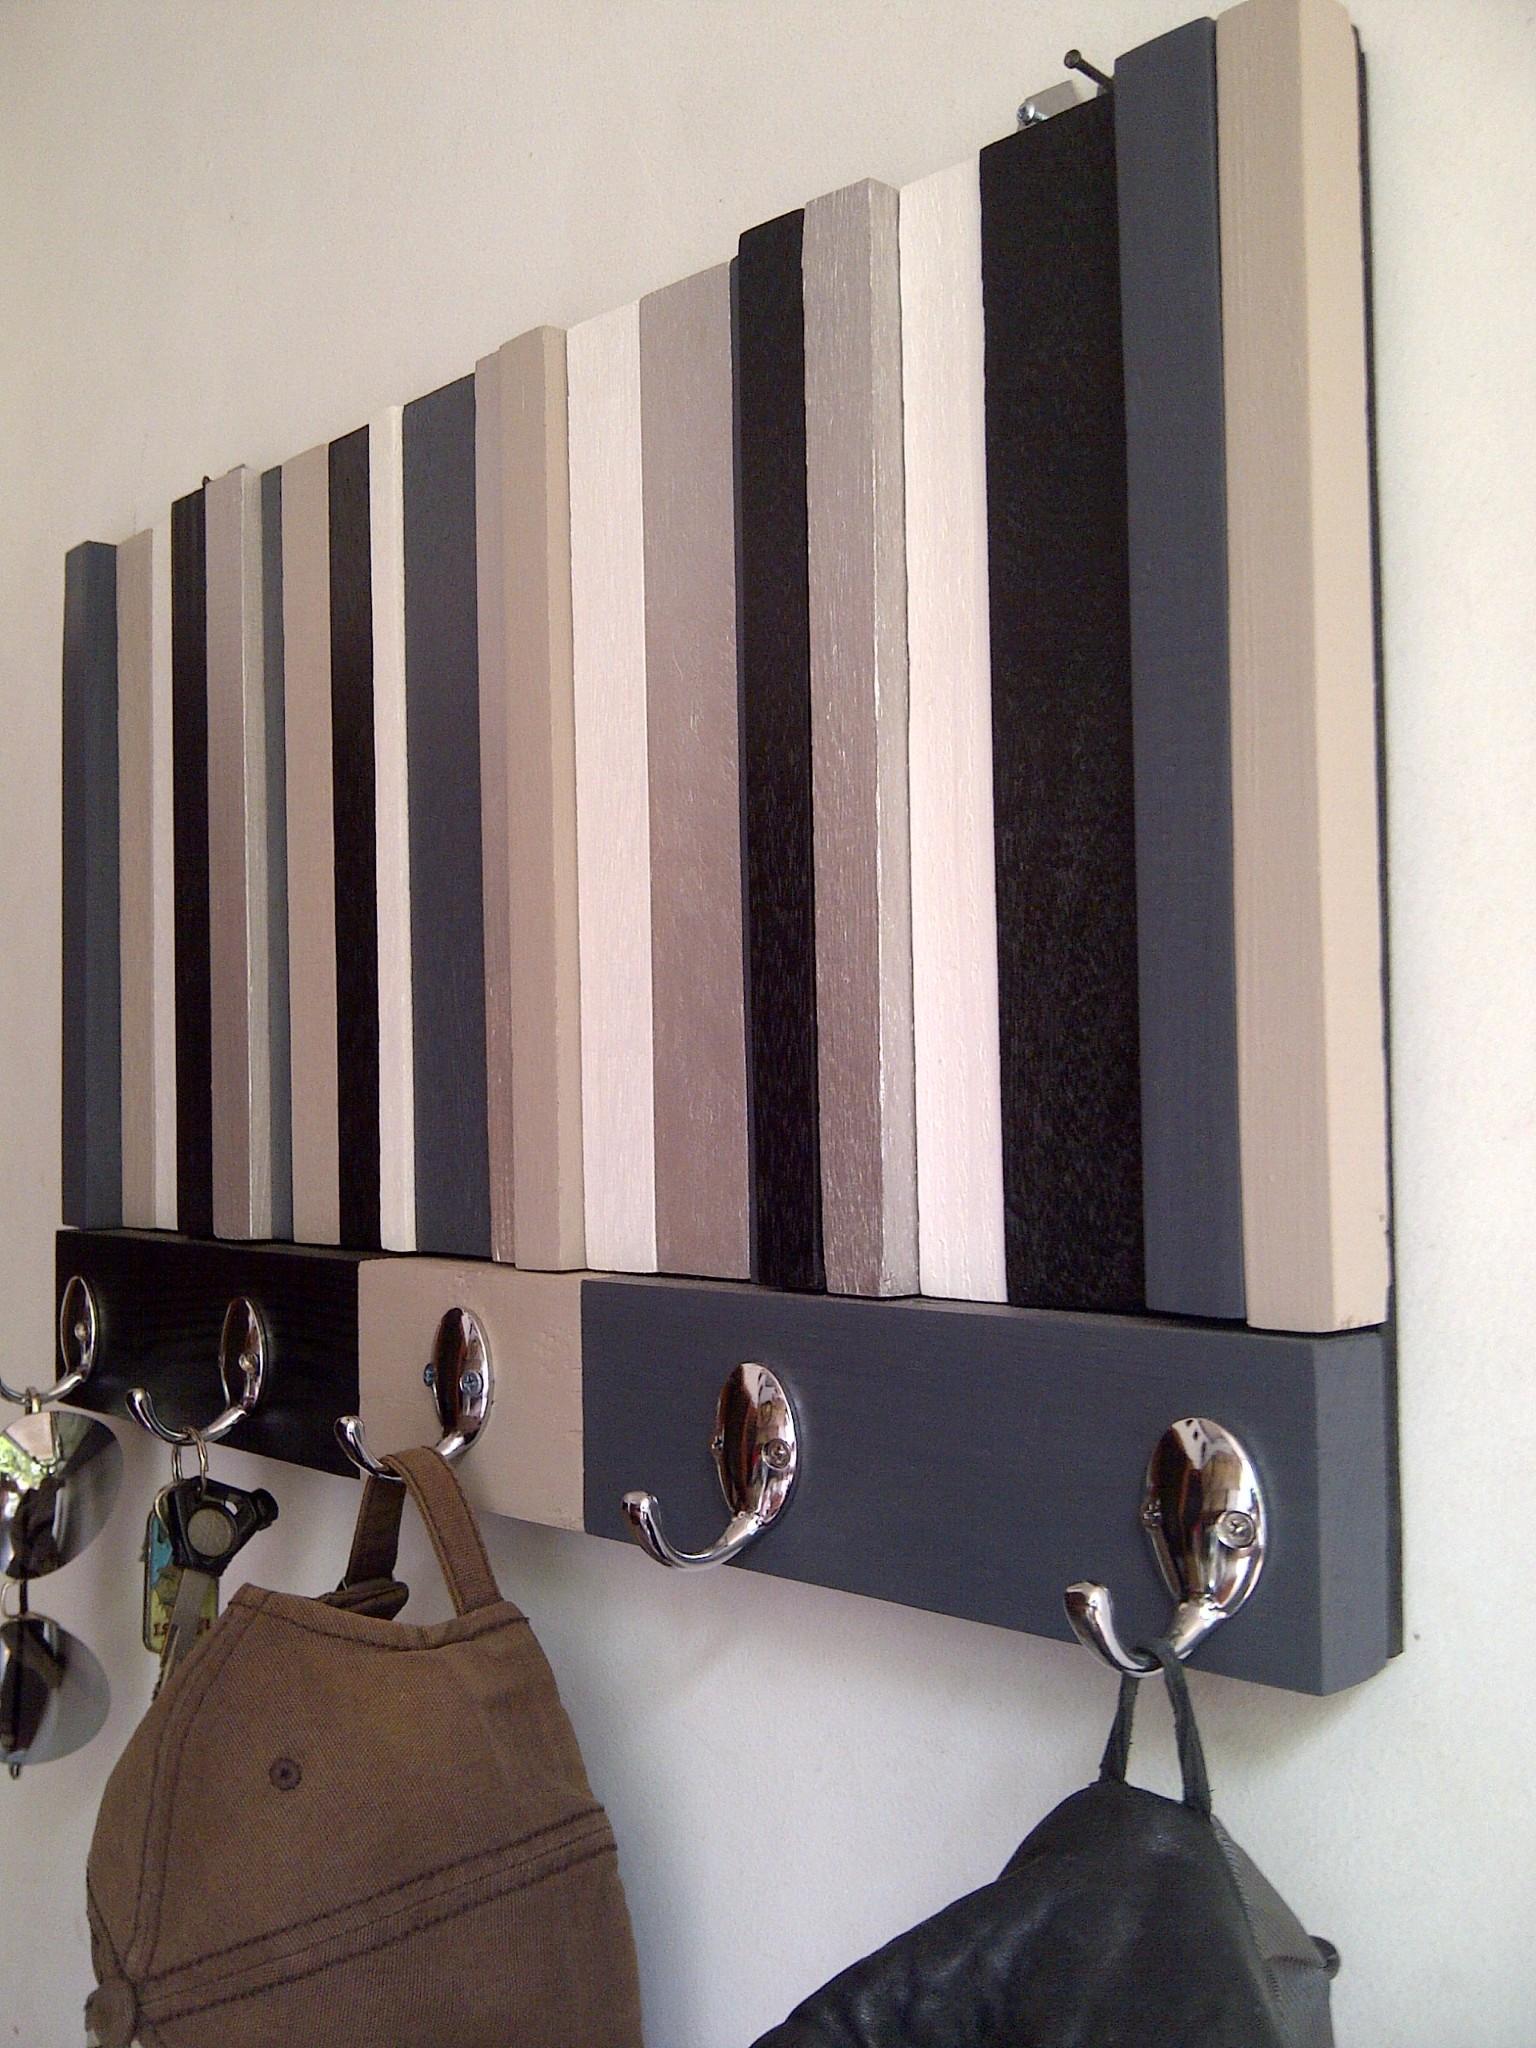 Jual kapstok kayu modern rustic. gantungan baju hitam putih silver ...